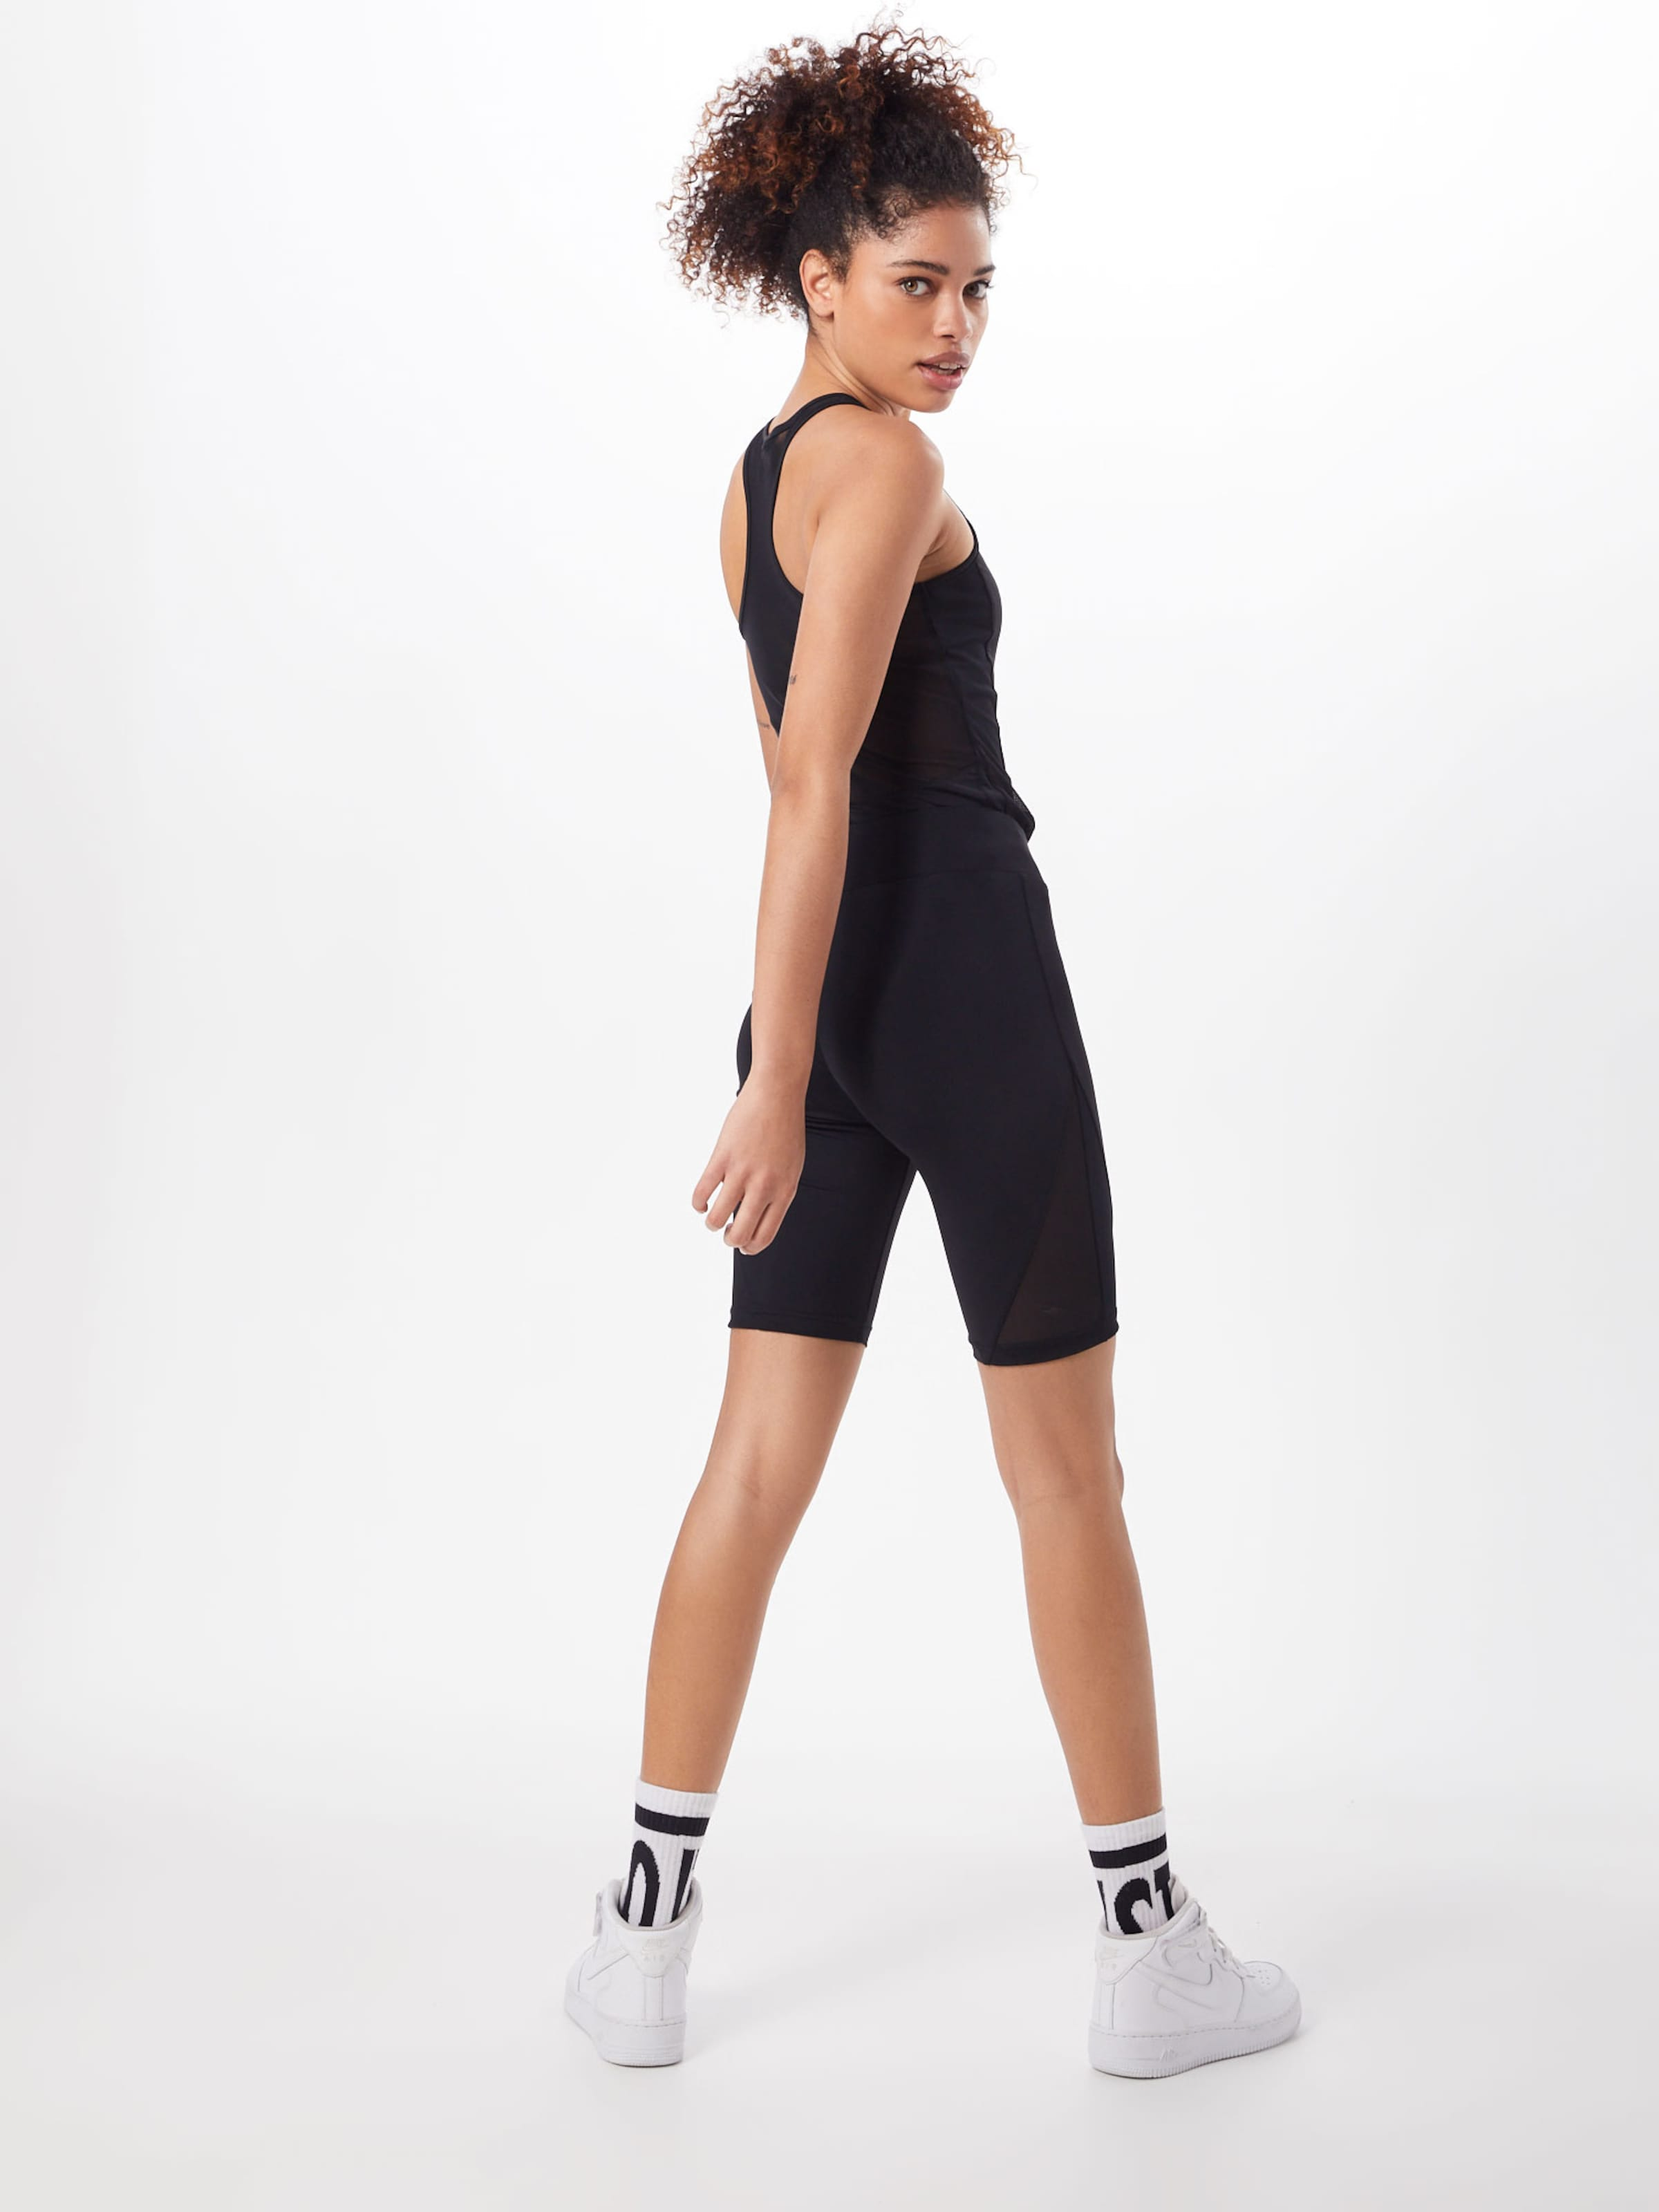 Urban Pantalon En Cycle Classics Fonctionnel 'ladies Mesh Tech Shorts' Noir kiuTXlOZwP